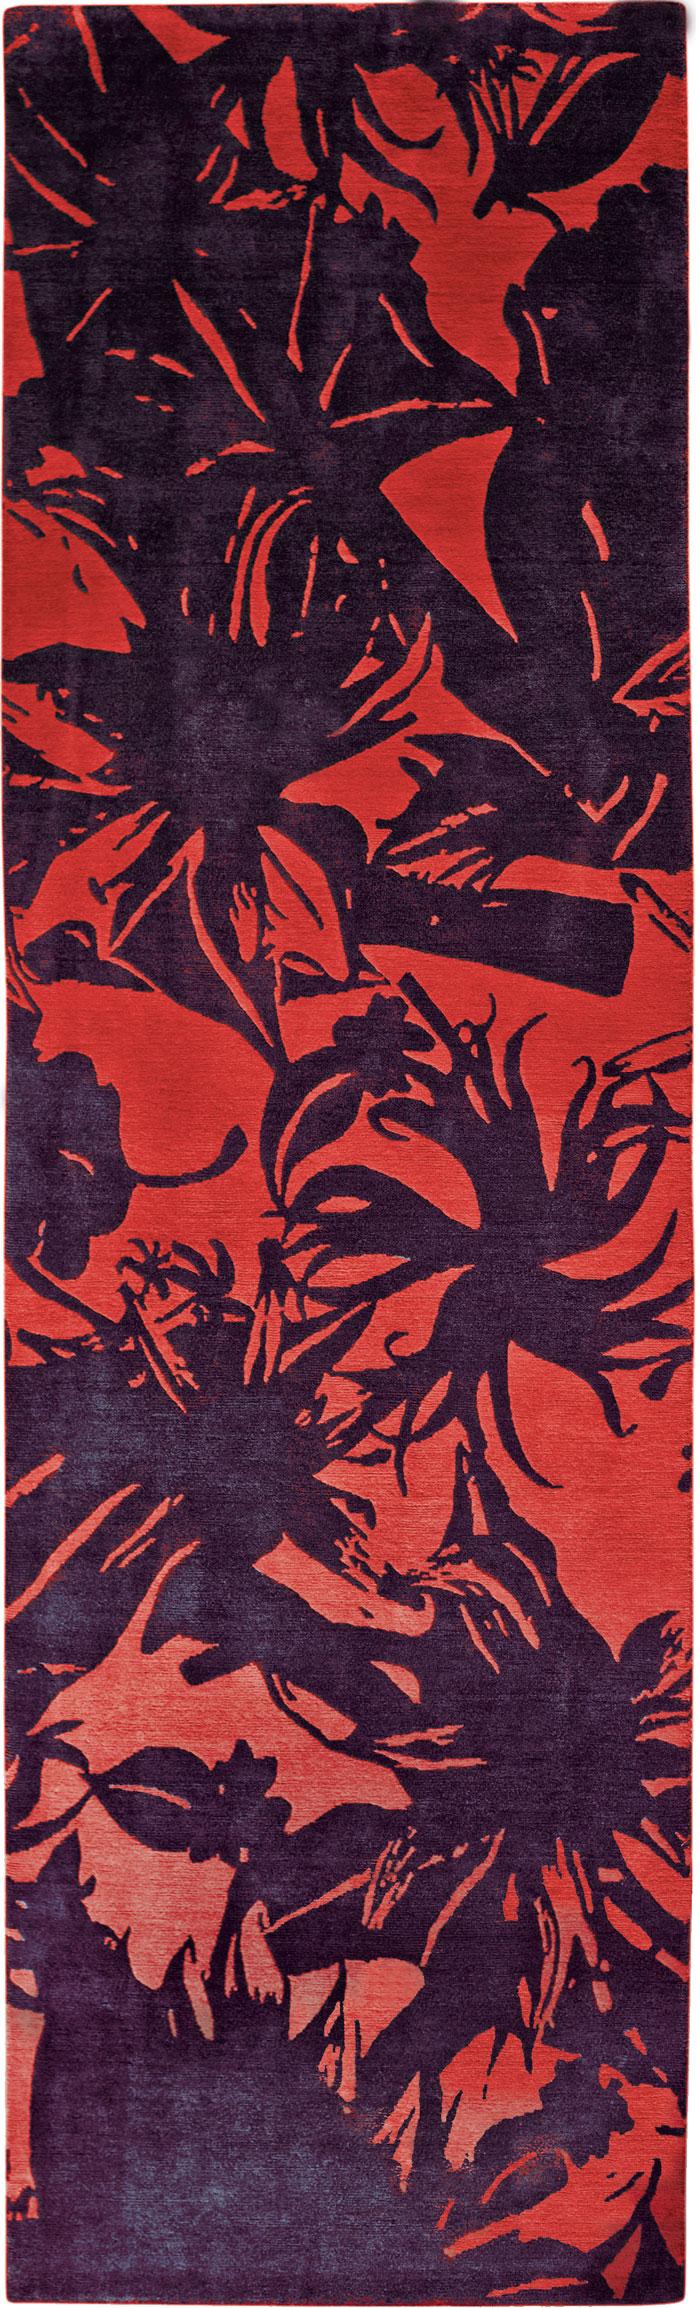 Jungle Floral Silhouette